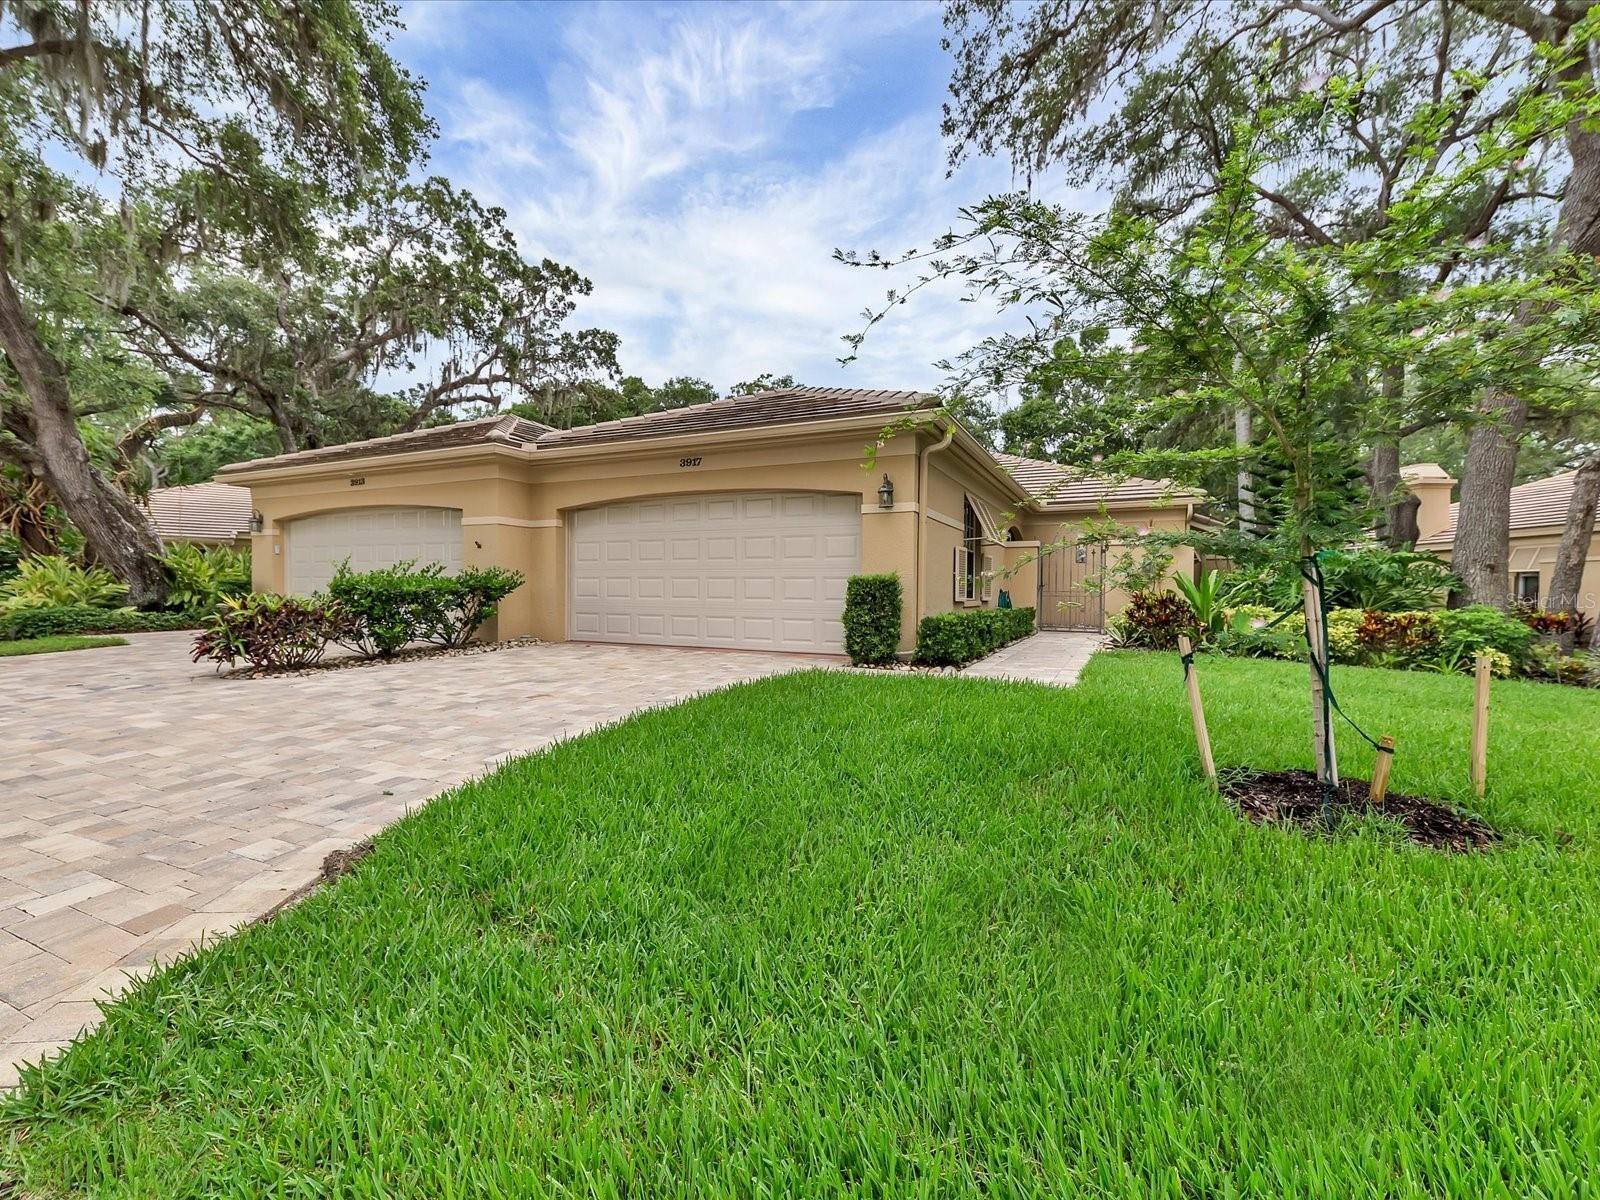 3917 OAKLEY GREENE #21, Sarasota, FL 34235 - #: A4503973